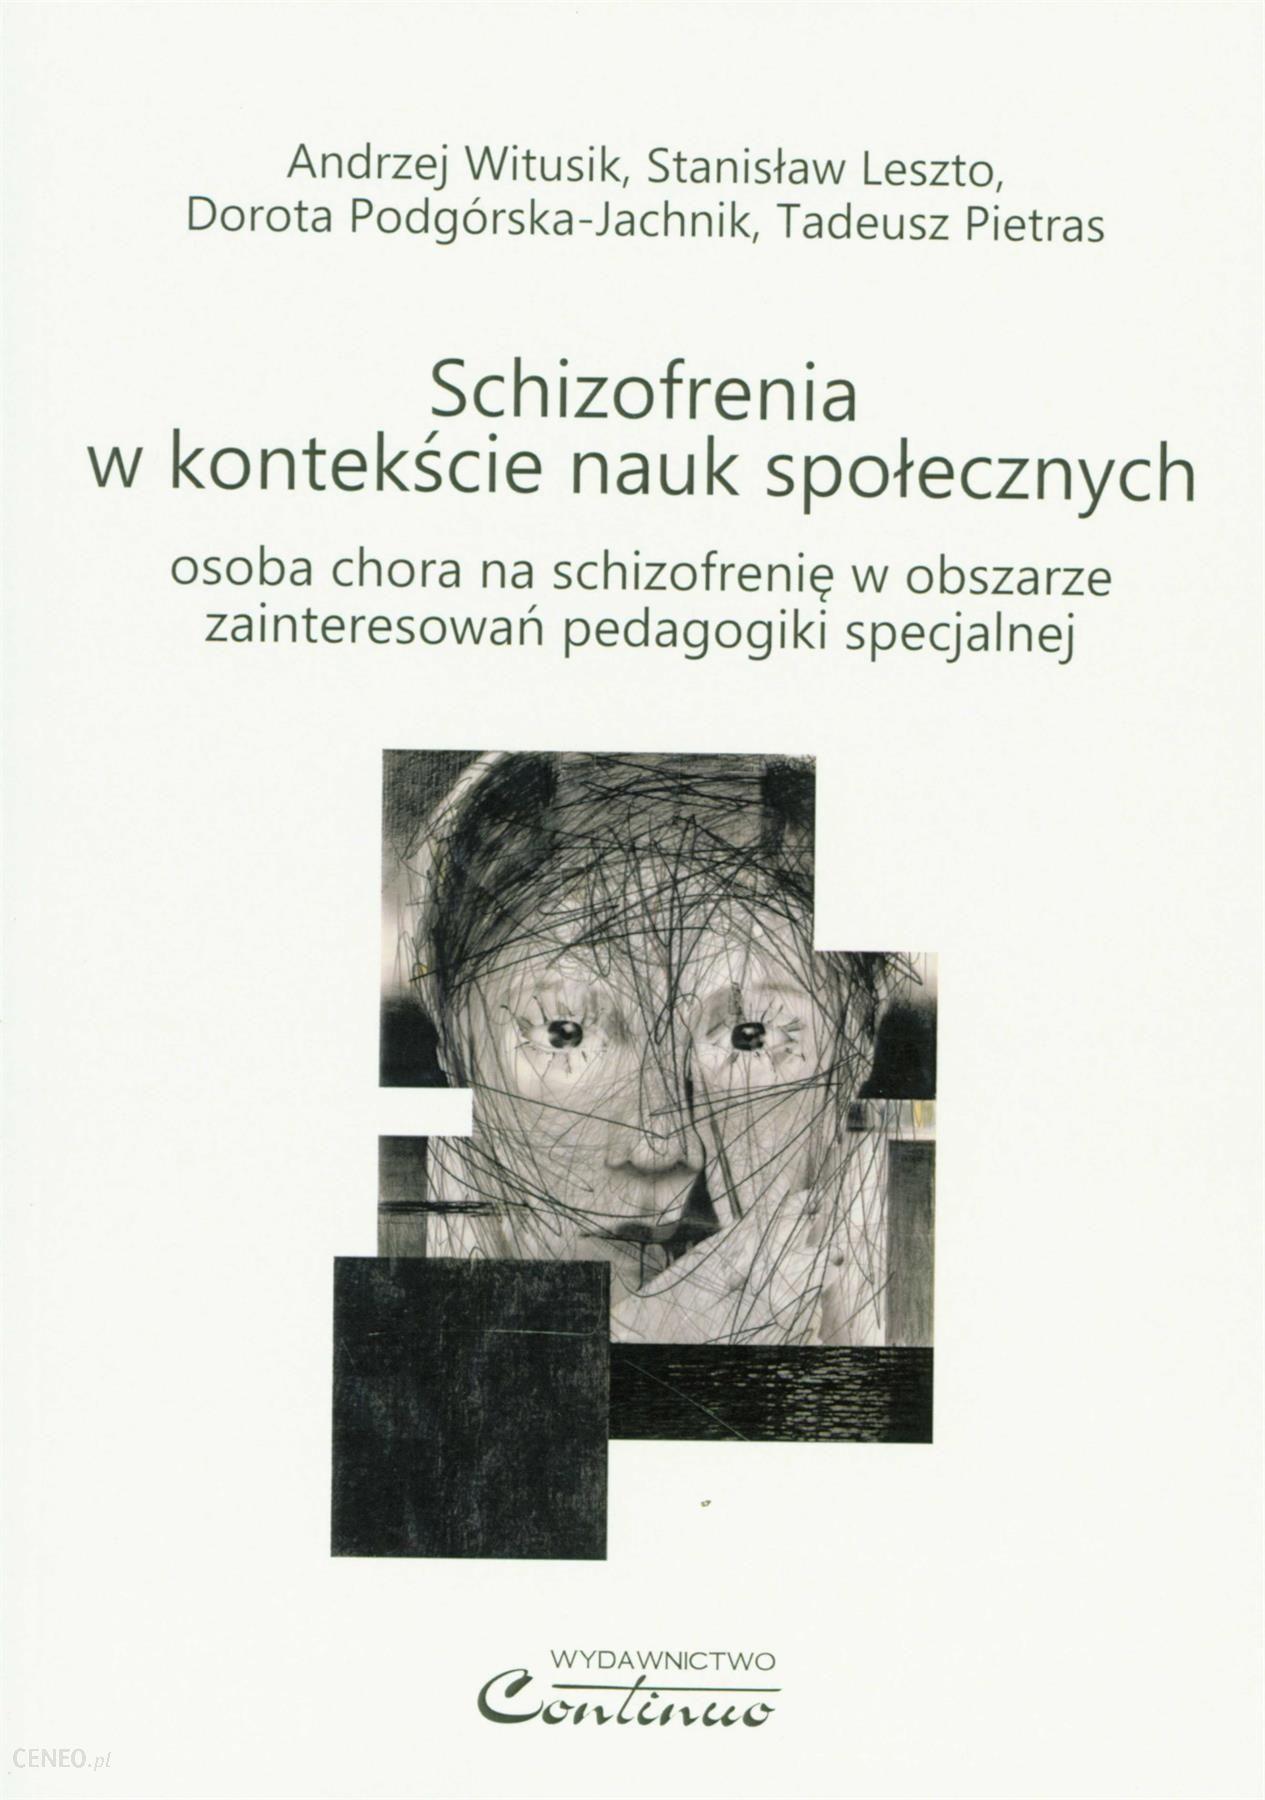 schizofrenia blog randkowy online londyn